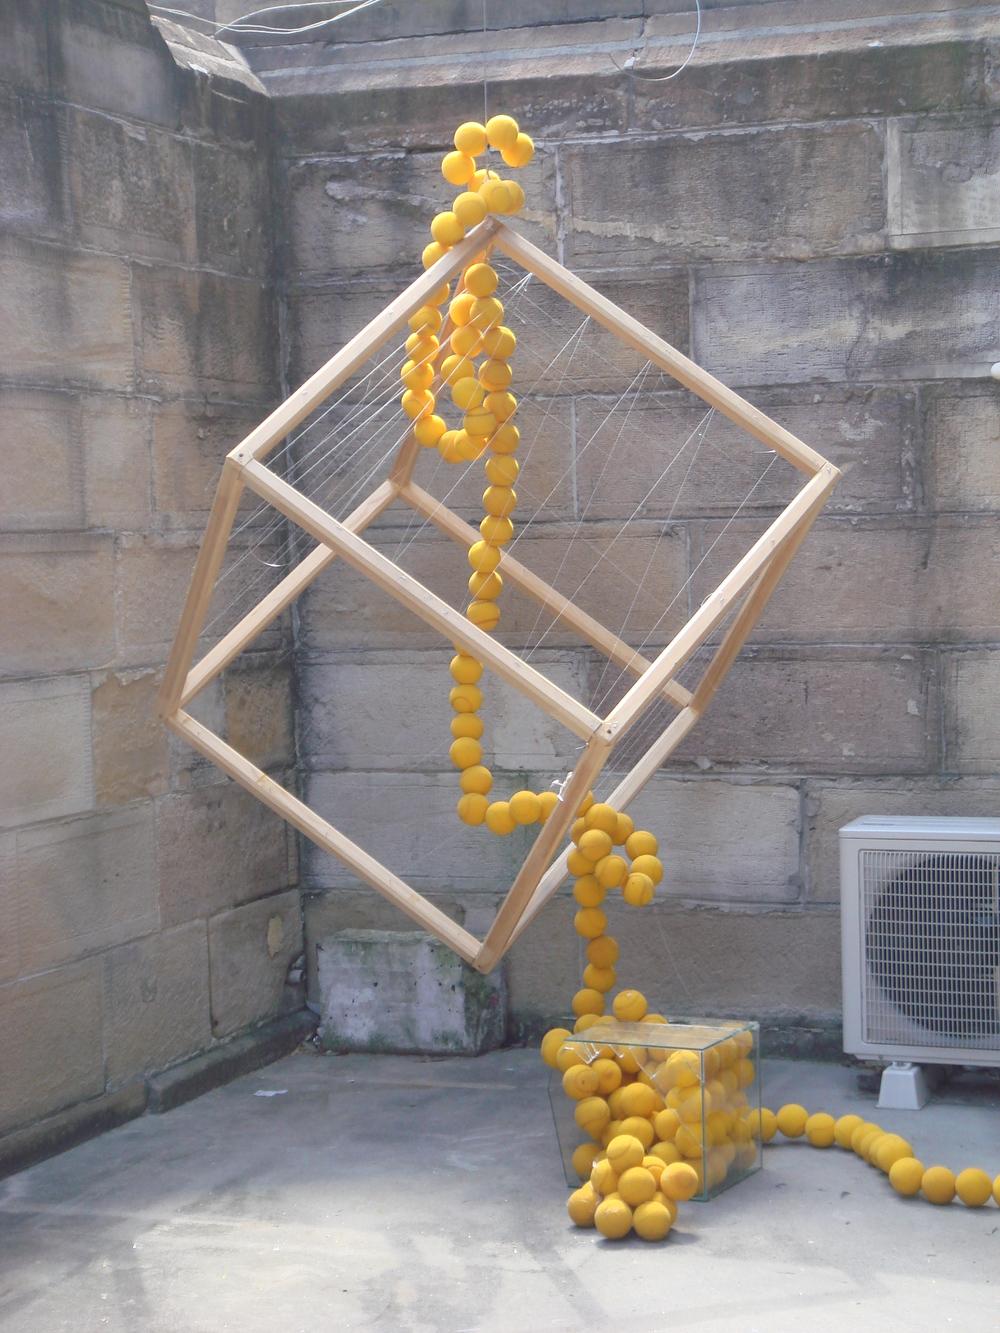 Yellow Balls Falling